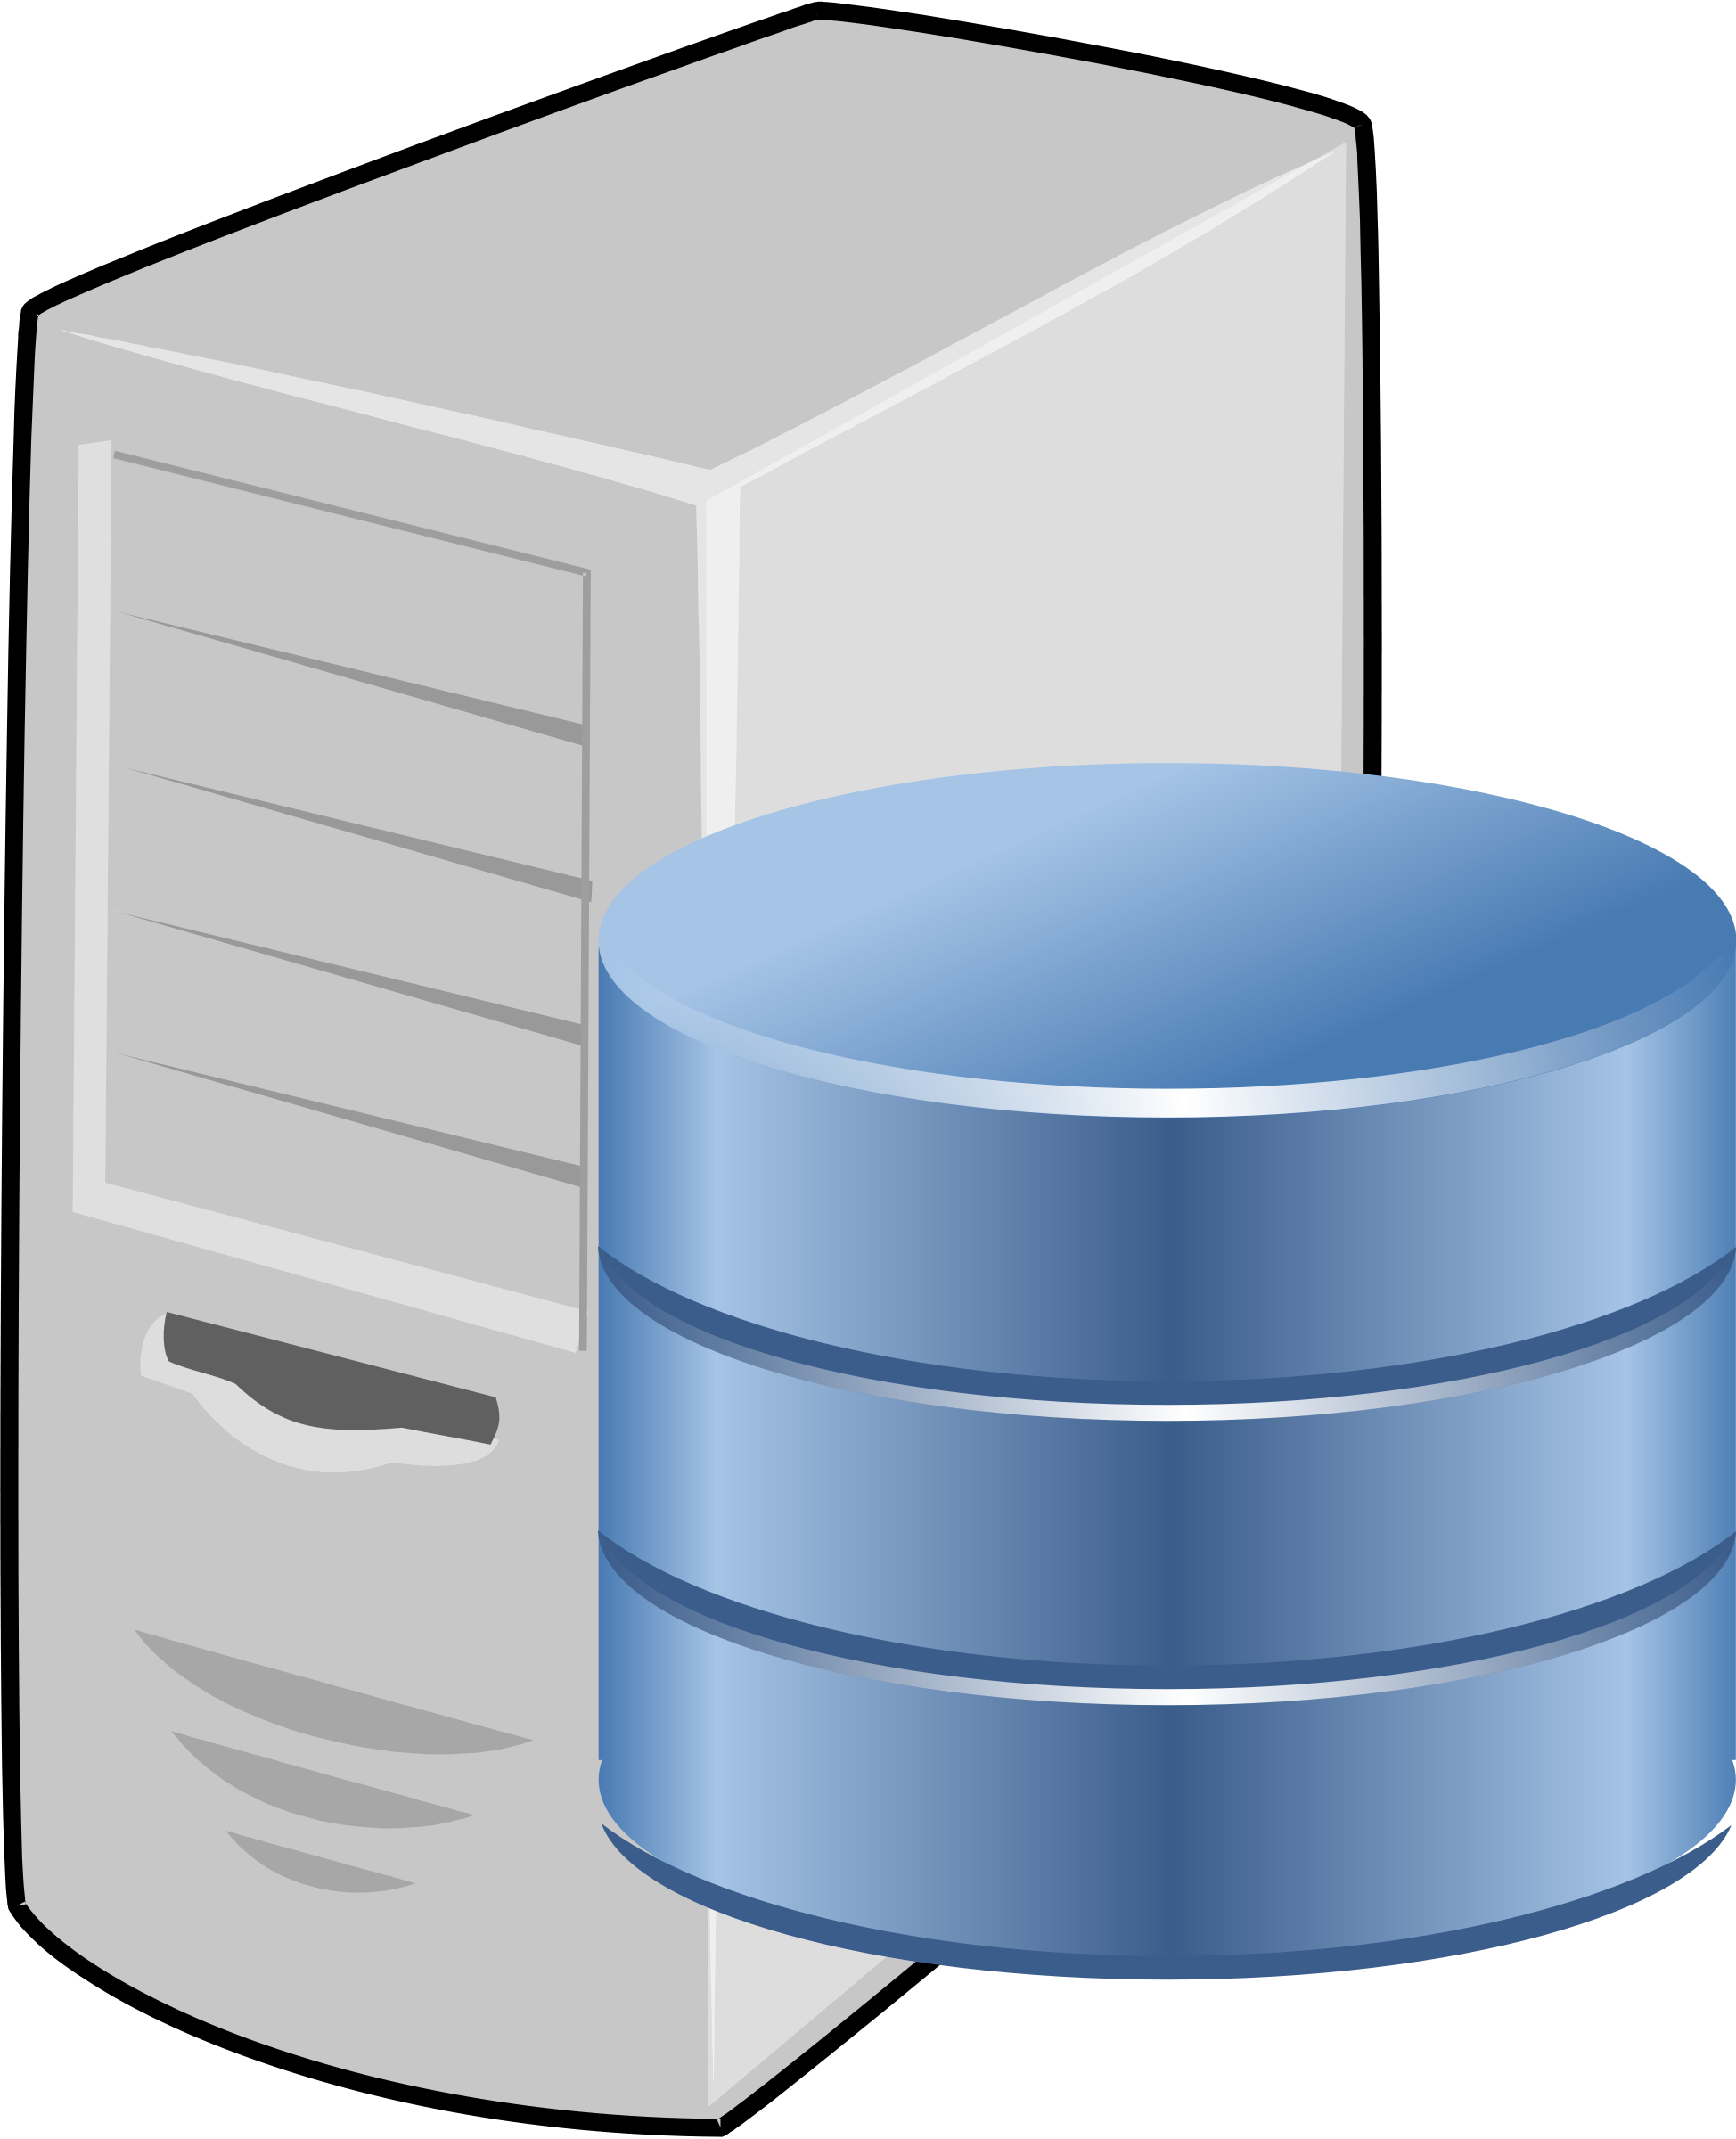 Free Cloud Server Cliparts, Download Free Clip Art, Free.